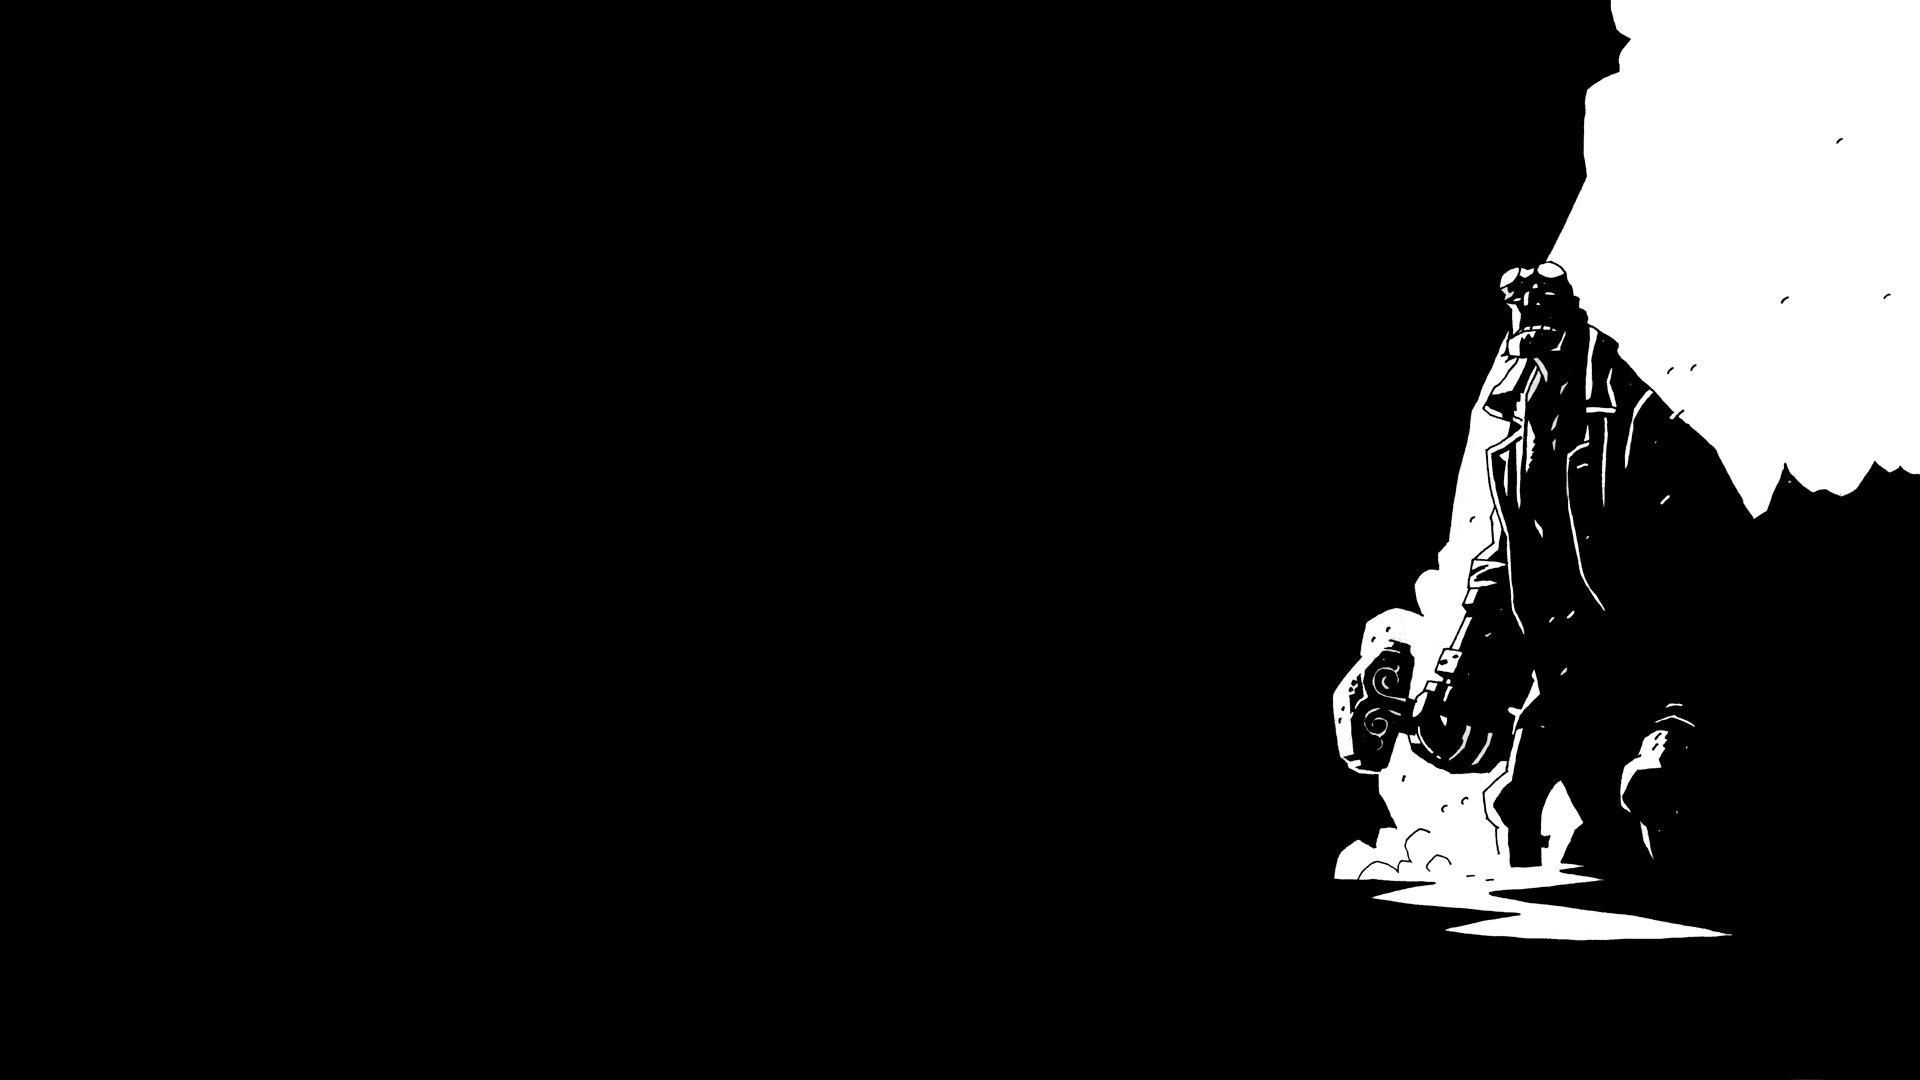 Hellboy Wallpapers 1920x1080 Full Hd 1080p Desktop Backgrounds